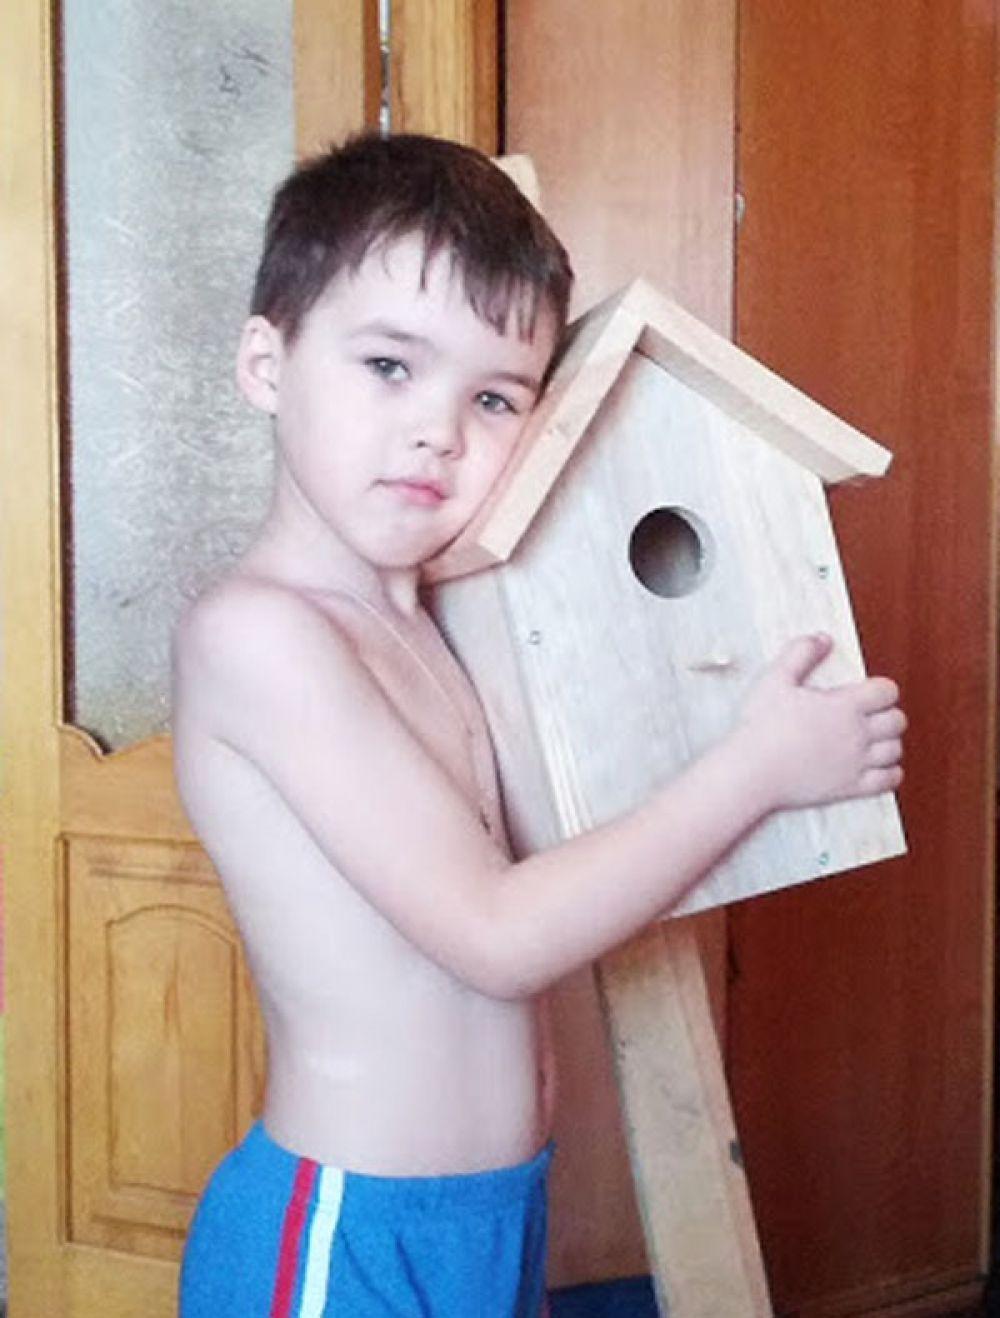 Участник №7. Кирилл Ханович, 6 лет